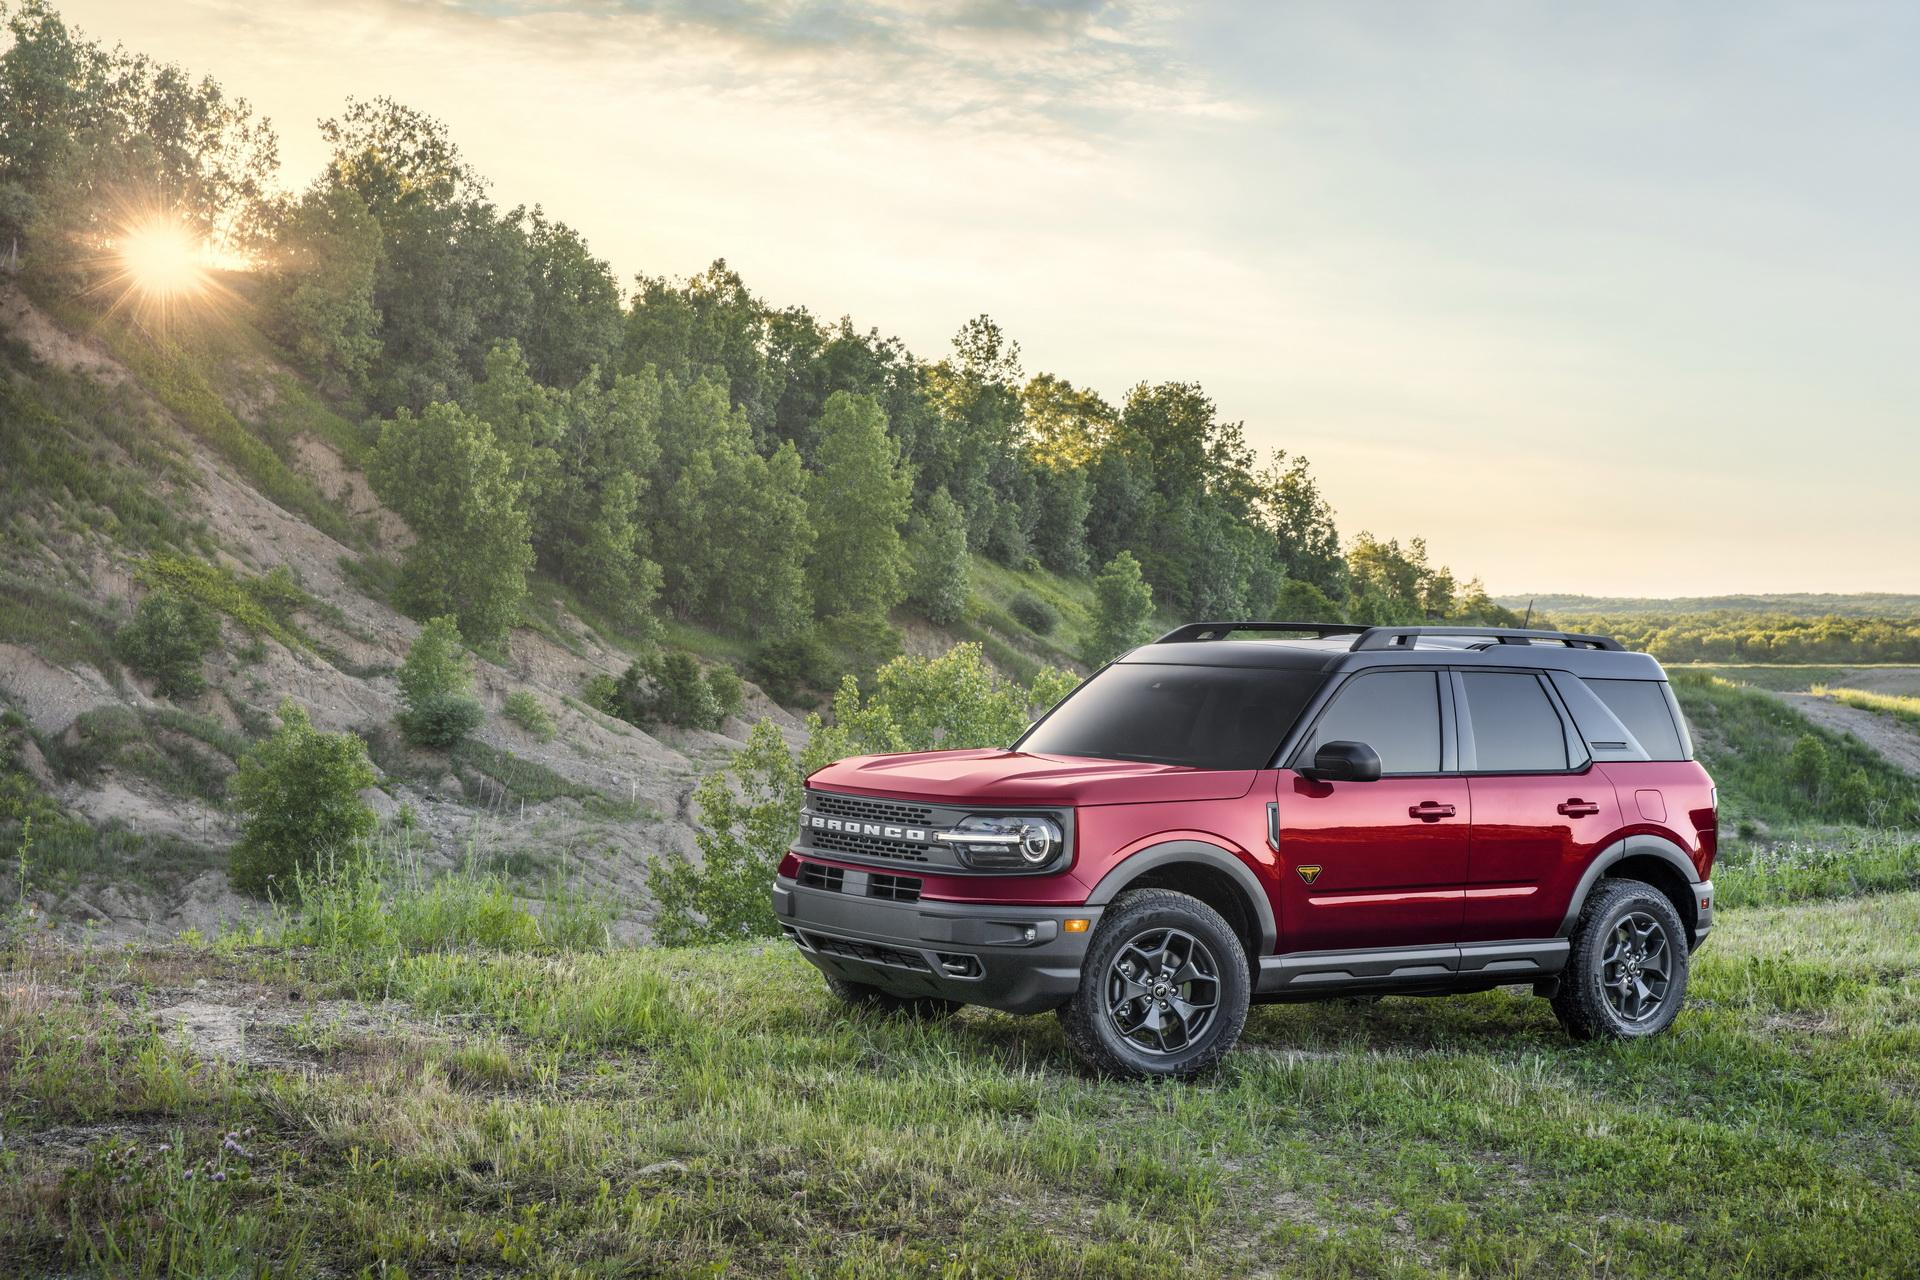 Kínos visszahívást jelentett be a Ford a Bronco Sport modellre